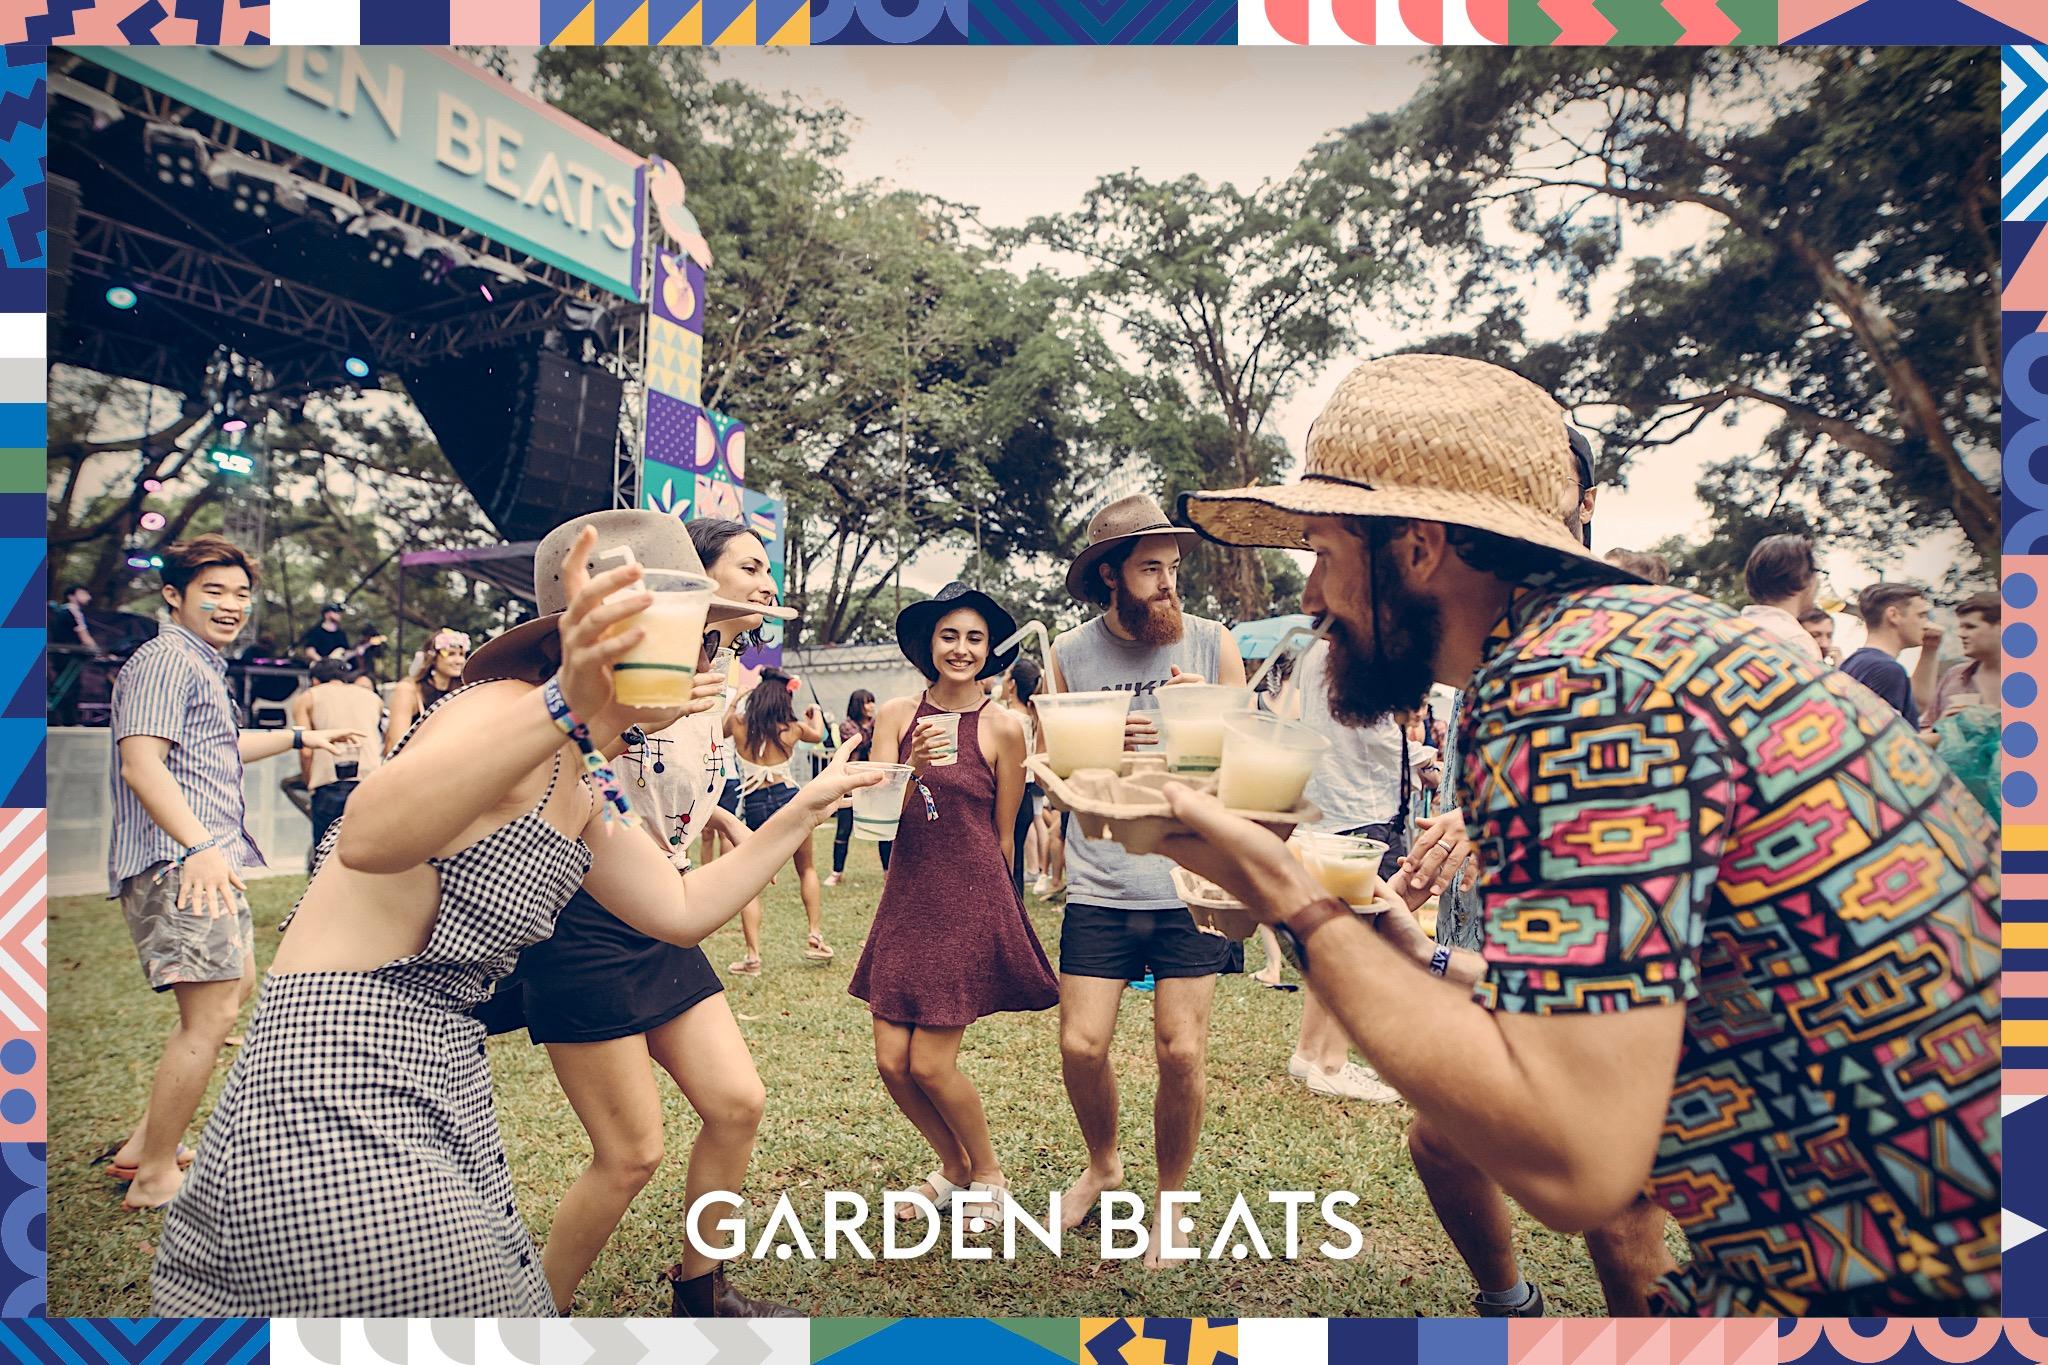 03032018_GardenBeats_Colossal544_Watermarked.jpg